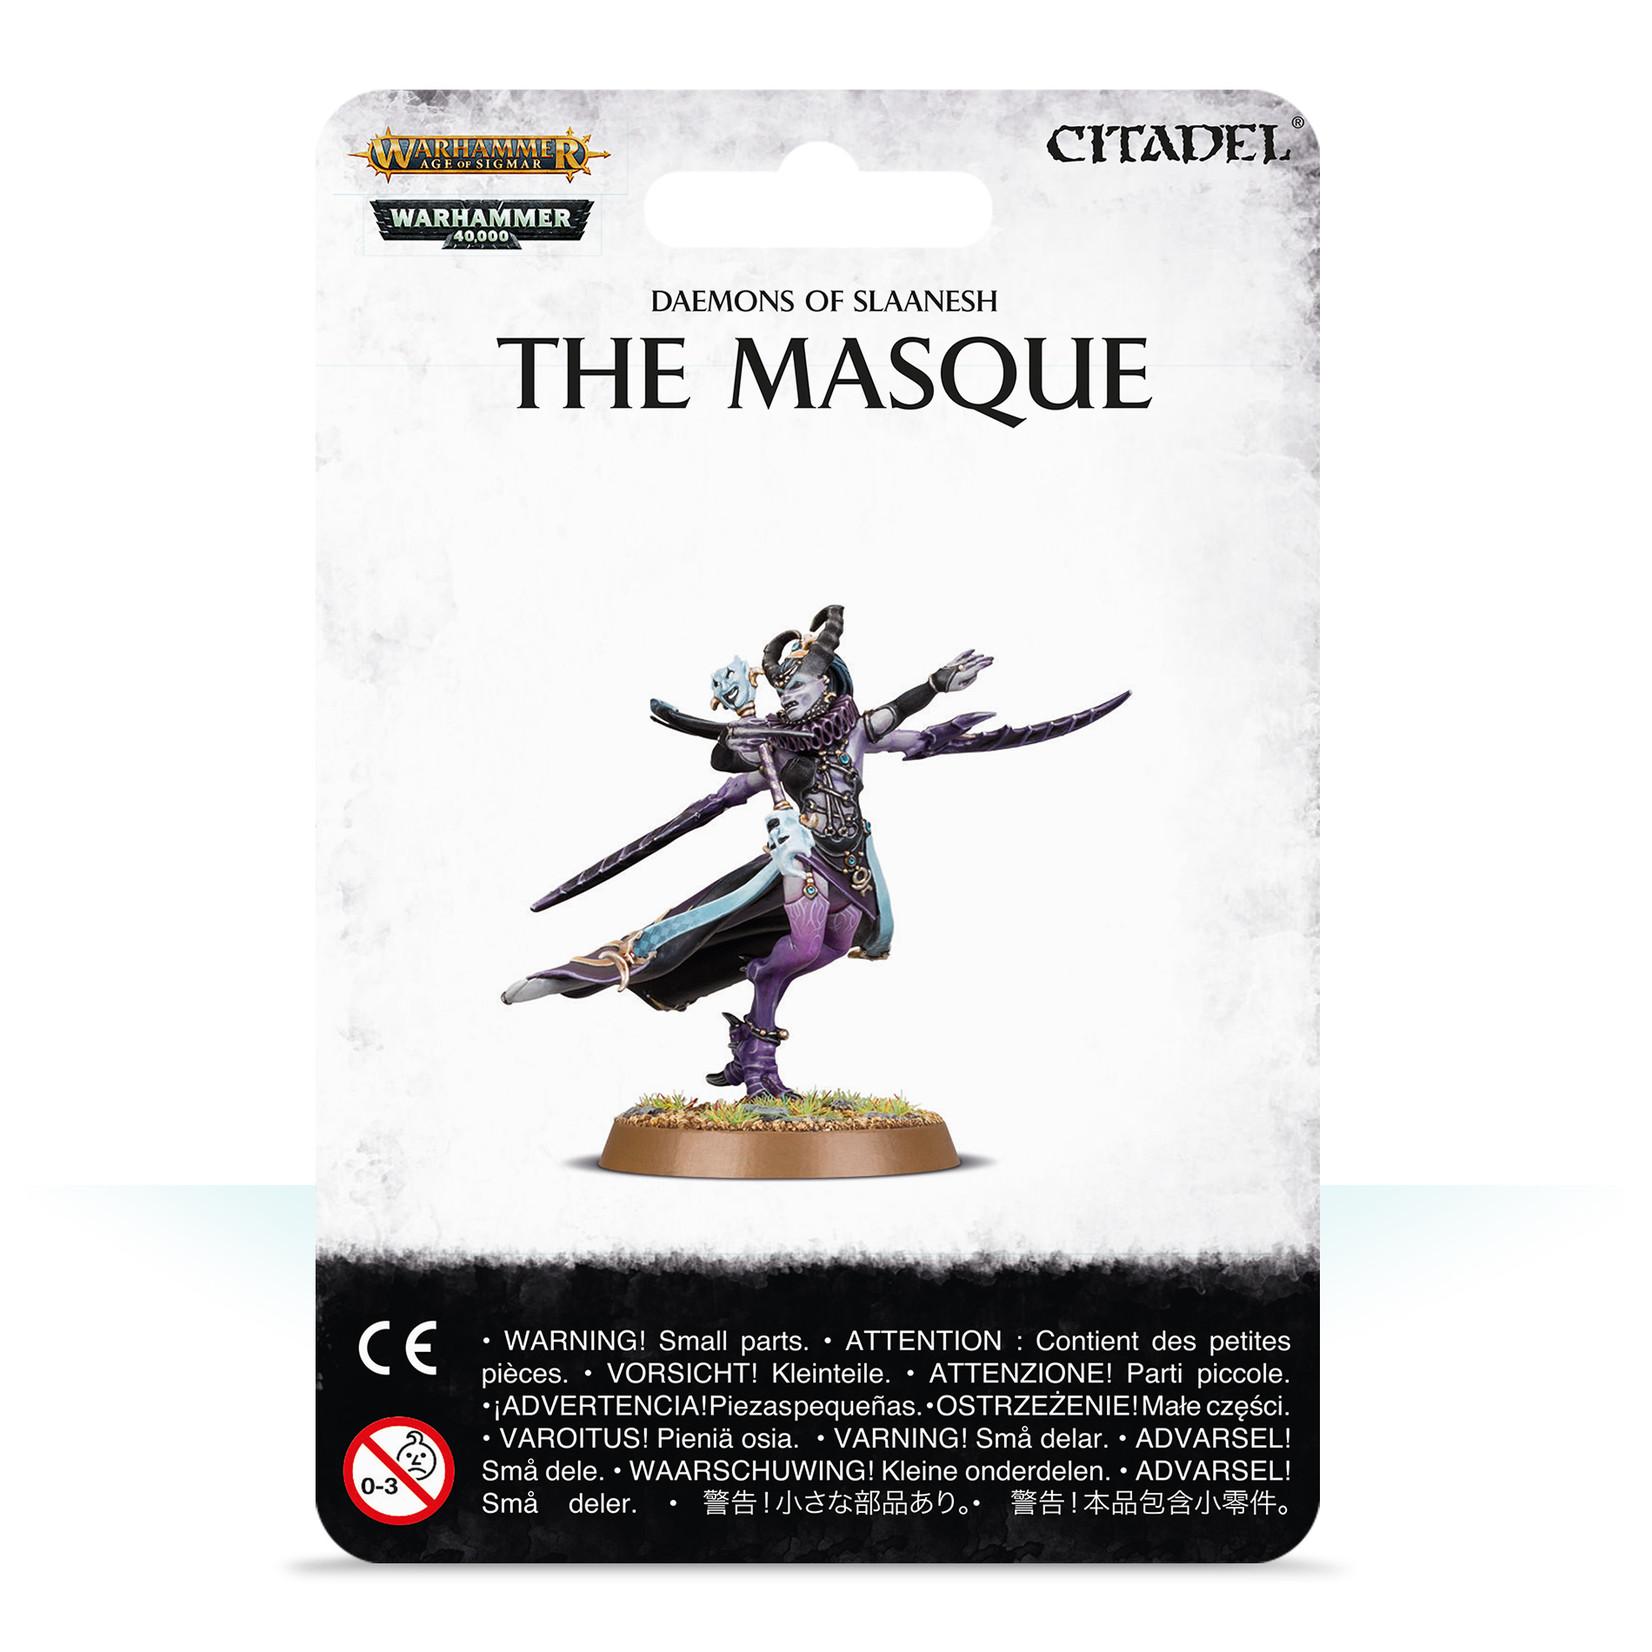 Daemons of Slaanesh The Masque (AOS)